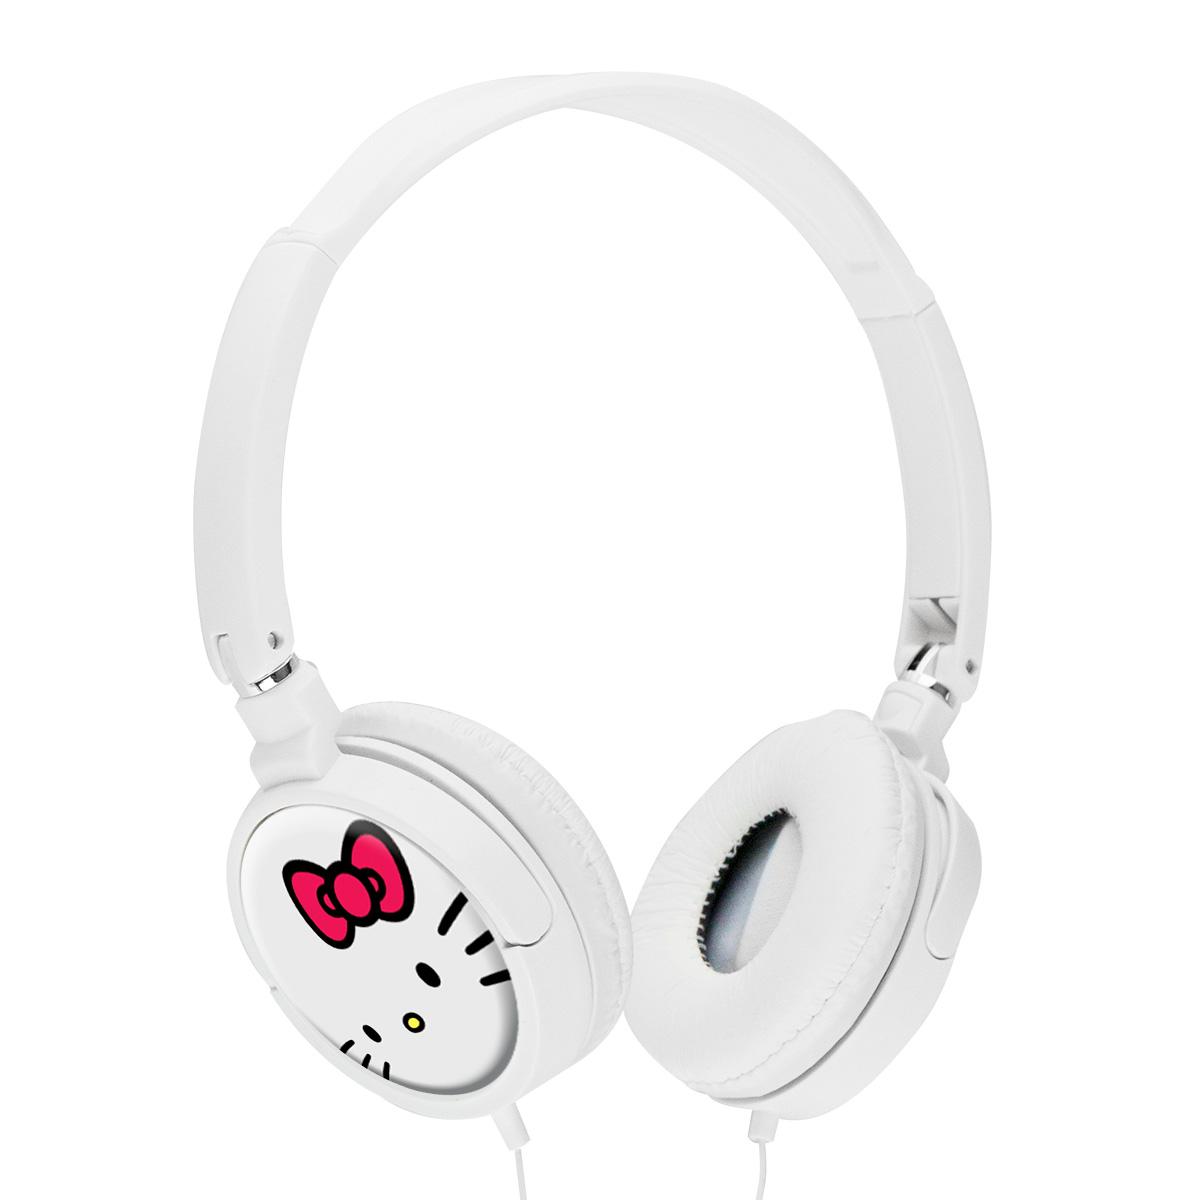 Fones de Ouvido Hello Kitty White